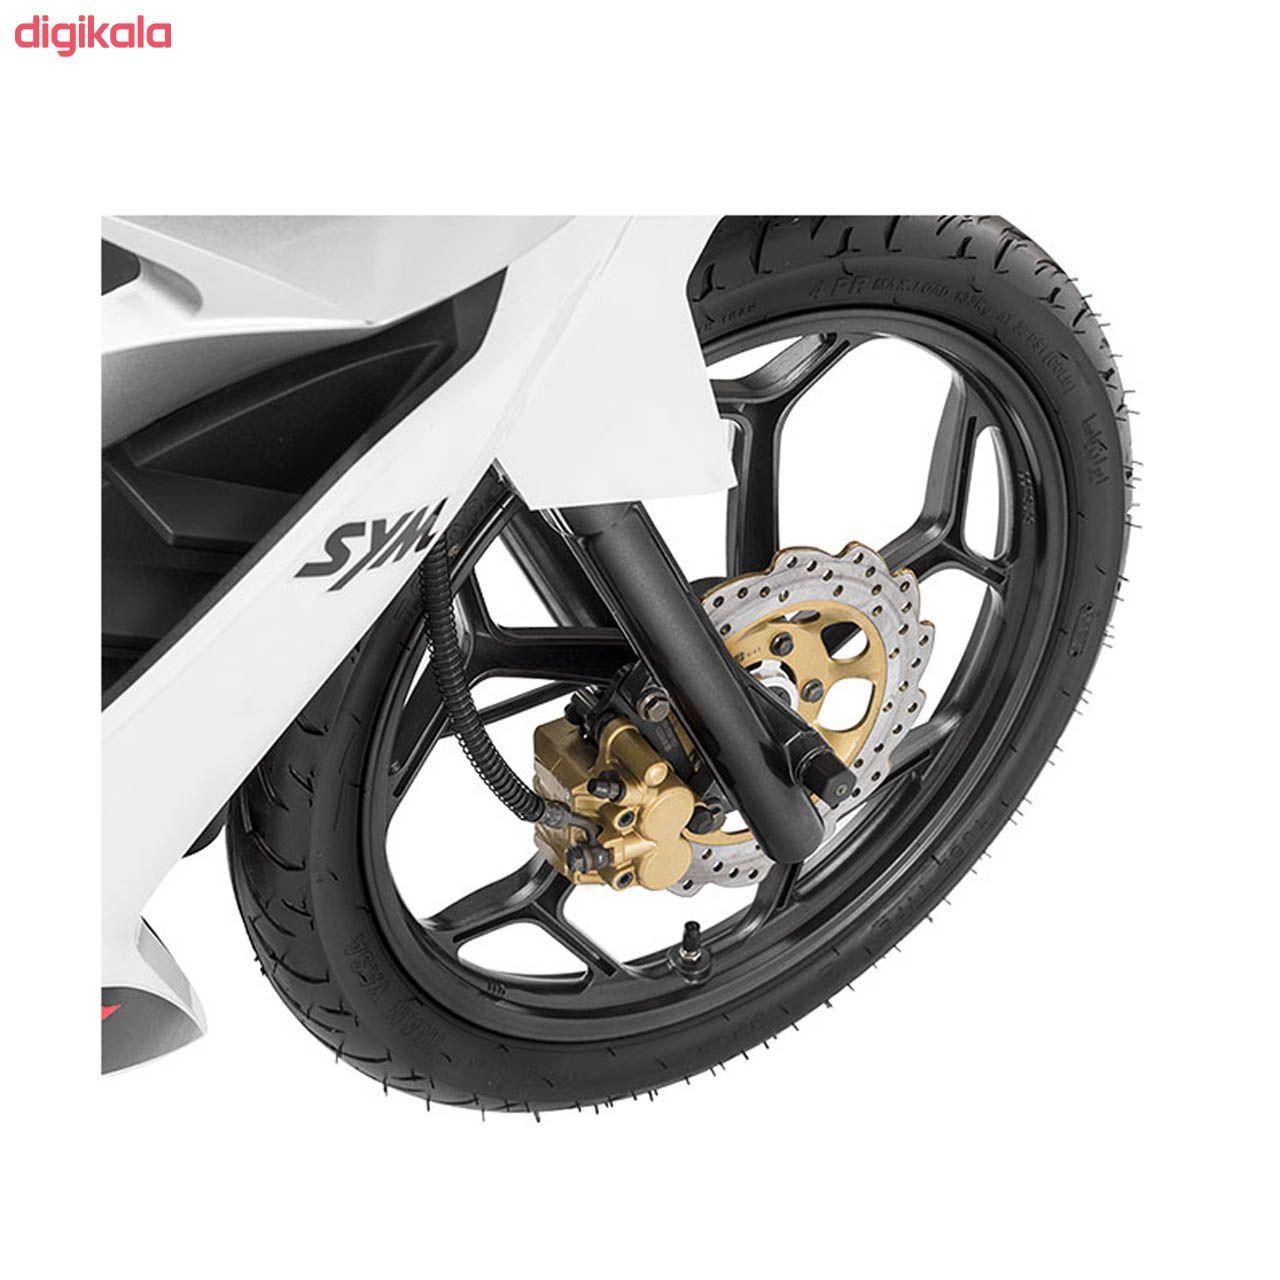 موتورسیکلت گلکسی مدل SR130 حجم 130 سی سیسال 1399 main 1 2